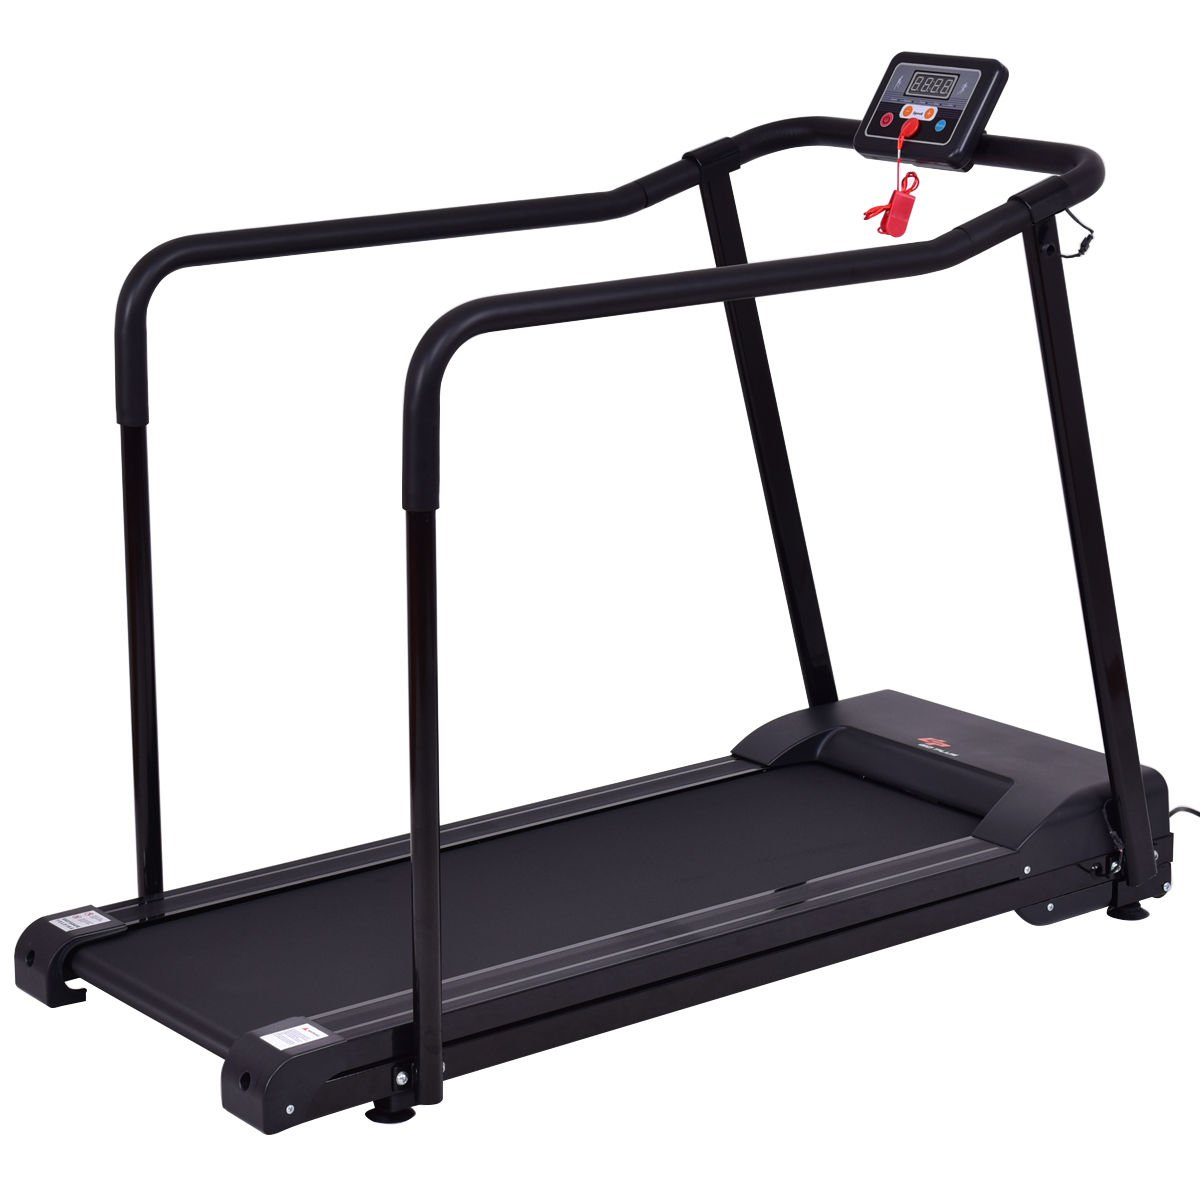 Goplus Electric Treadmill Walking Jogging Machine for Seniors Elders 0.6-4 MPH Adjustable Speed W/Extra-Long Handles